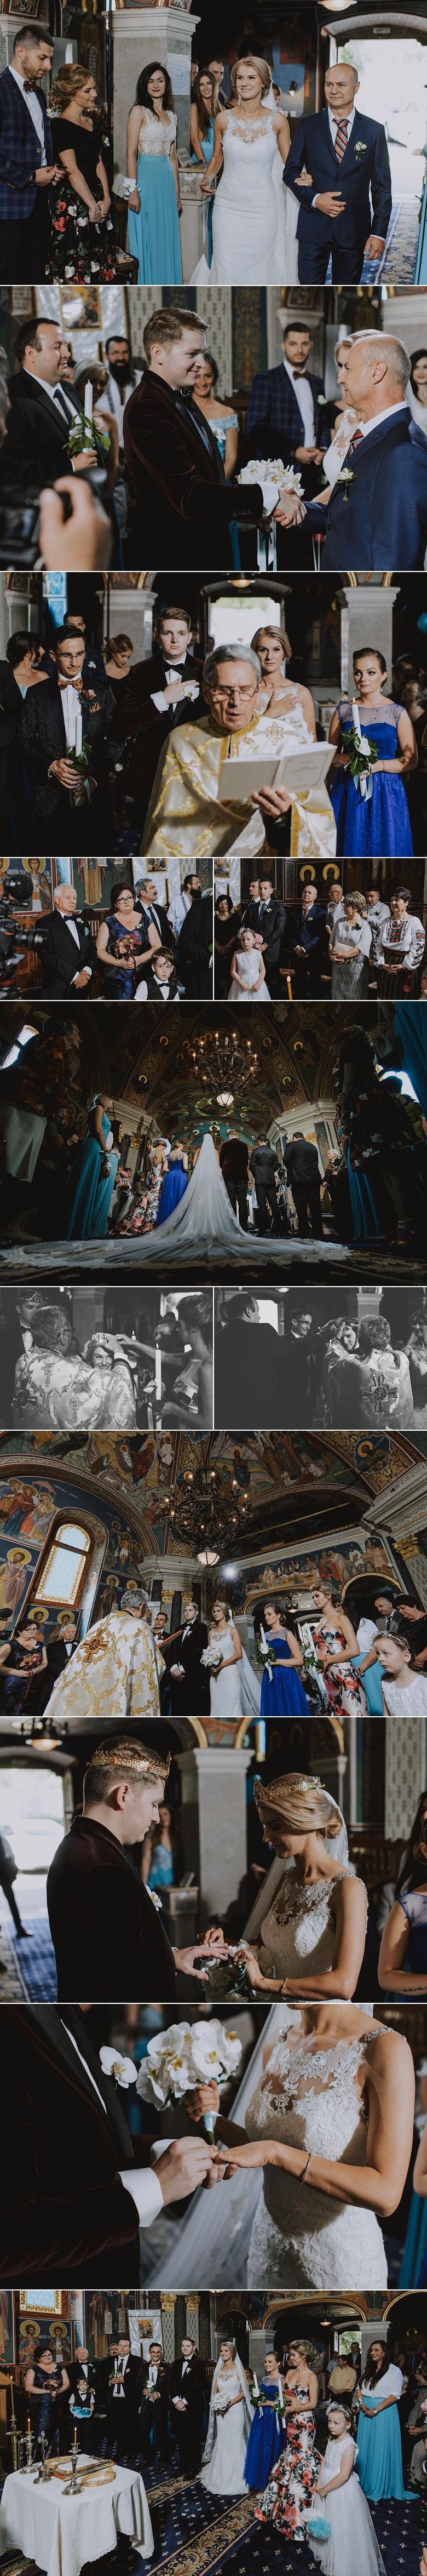 poze_cluj_nunta_cluj_foto_video_nunta_cluj_fimare_4k_cluj_fotograf_profesionist_cluj-4